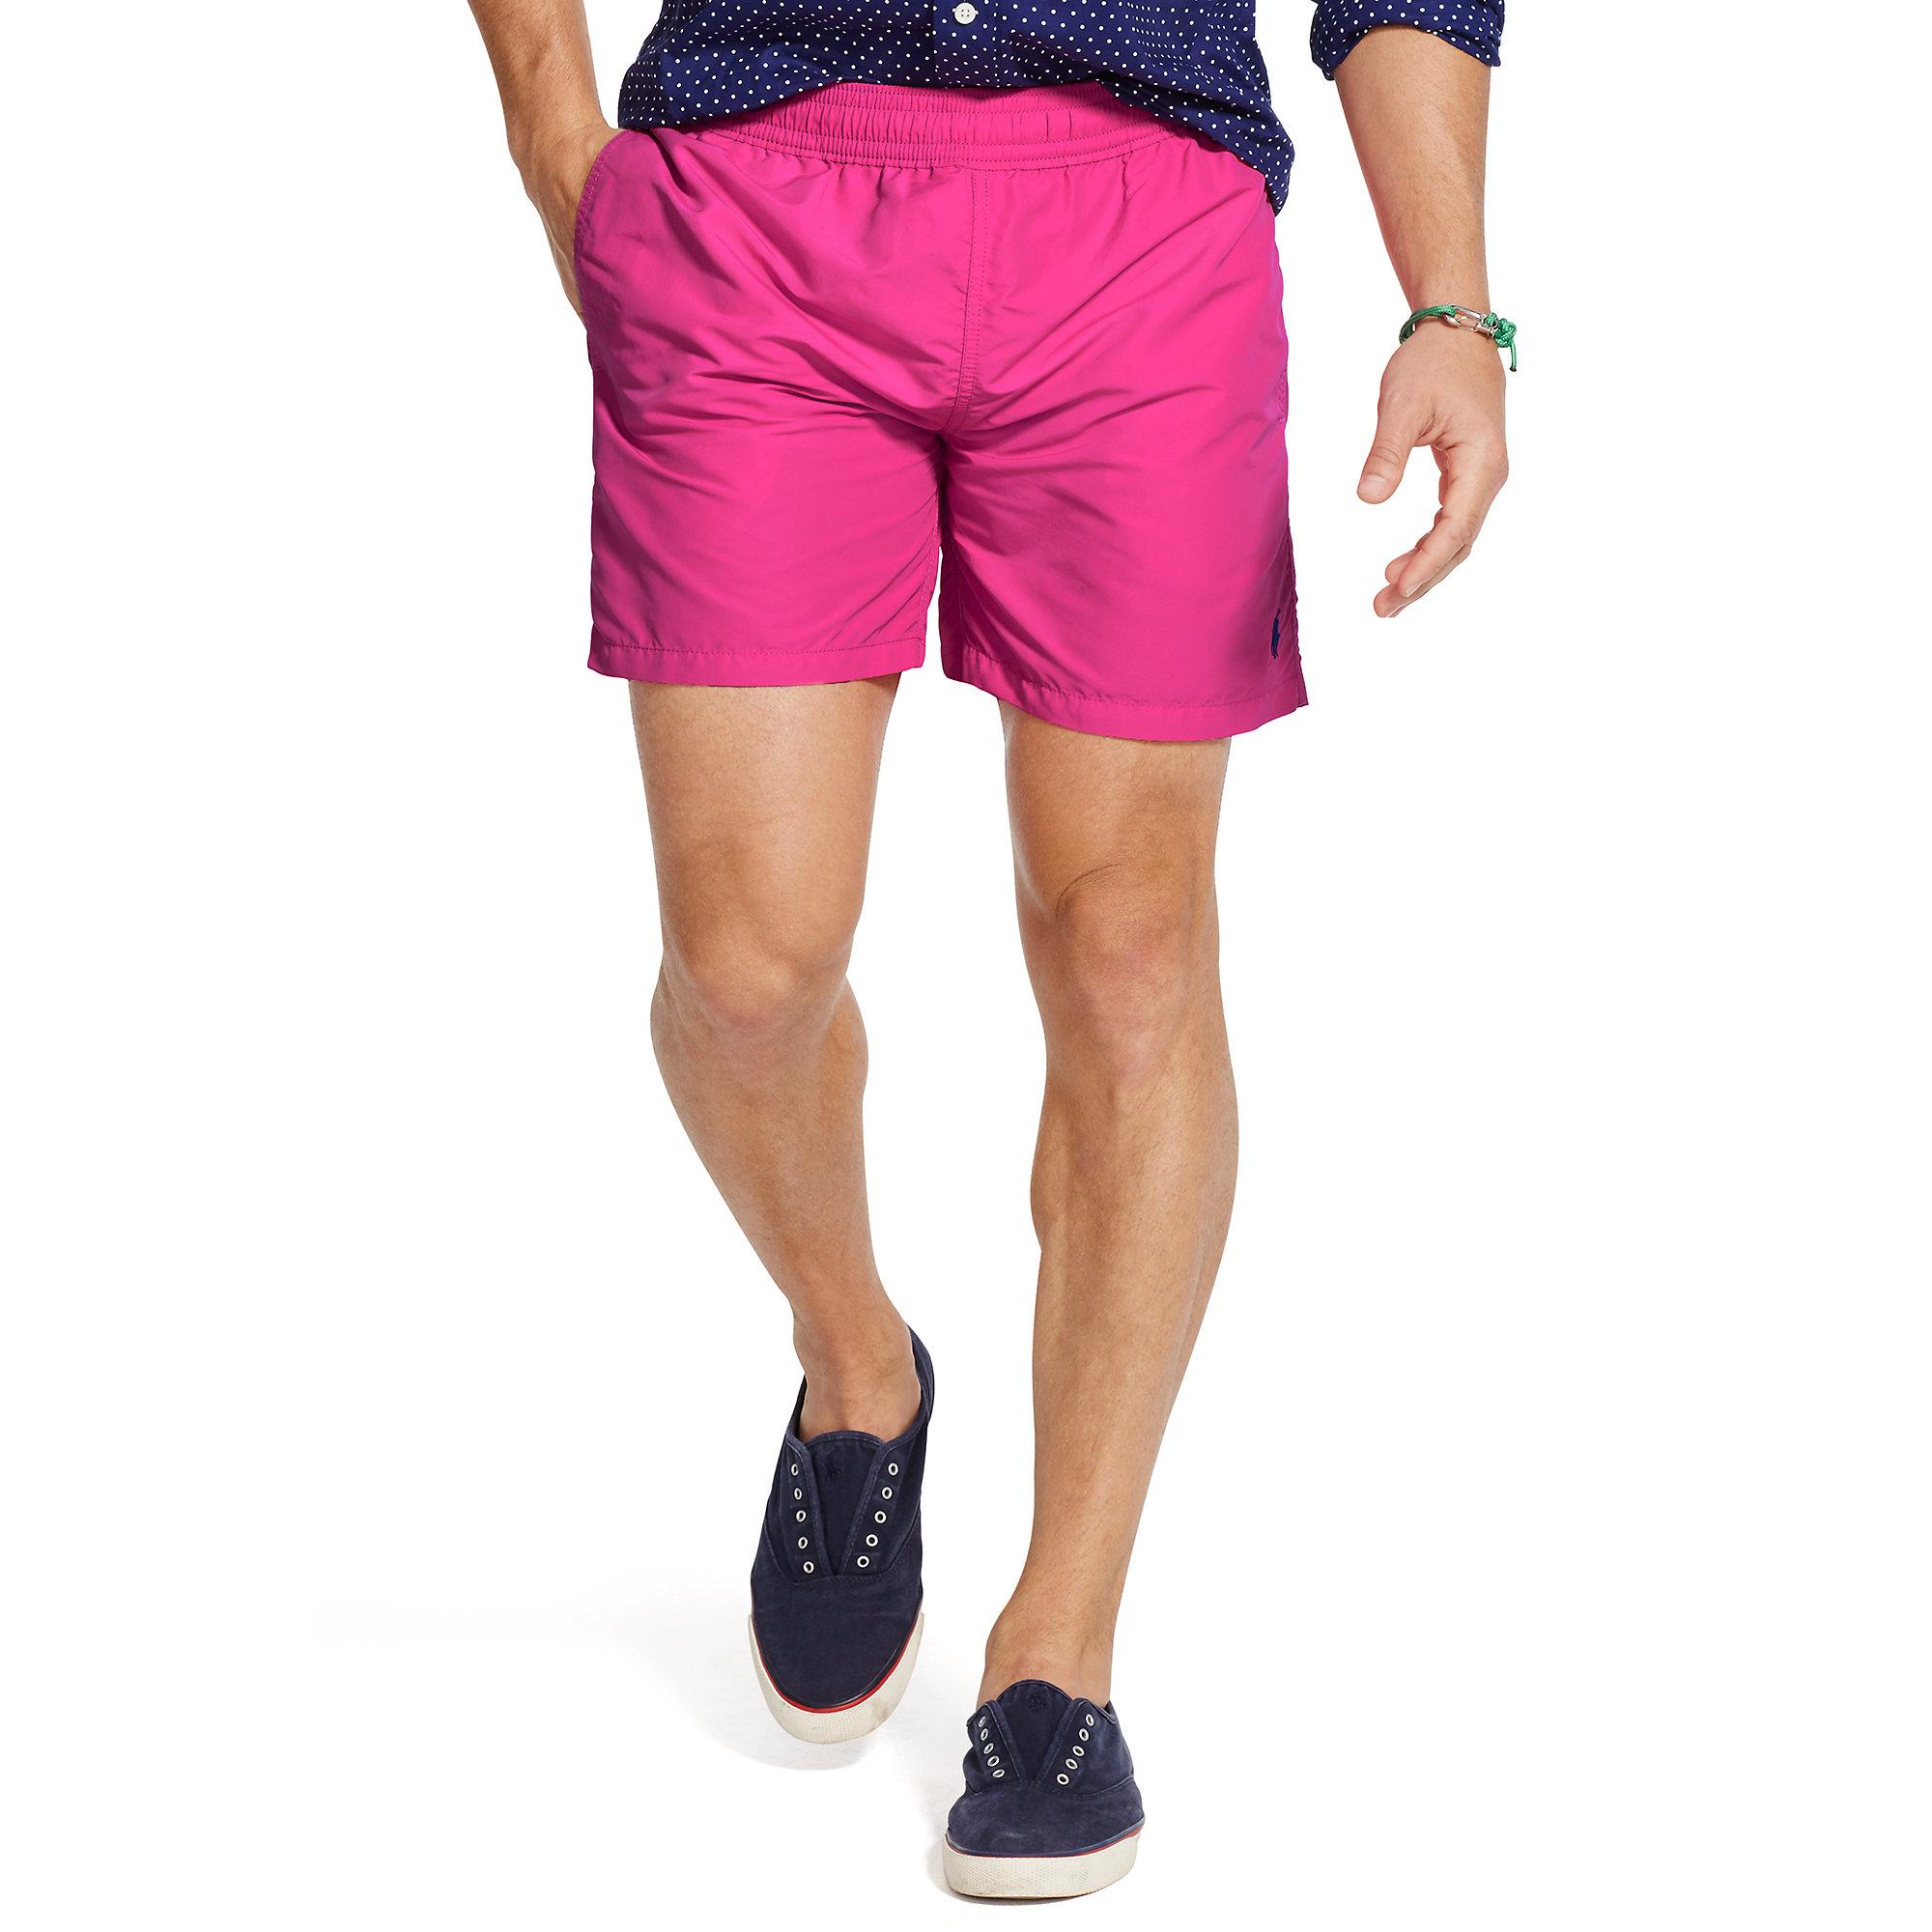 da2bdc0b8d Polo Ralph Lauren 5¾-inch Hawaiian Swim Trunk in Pink for Men - Lyst